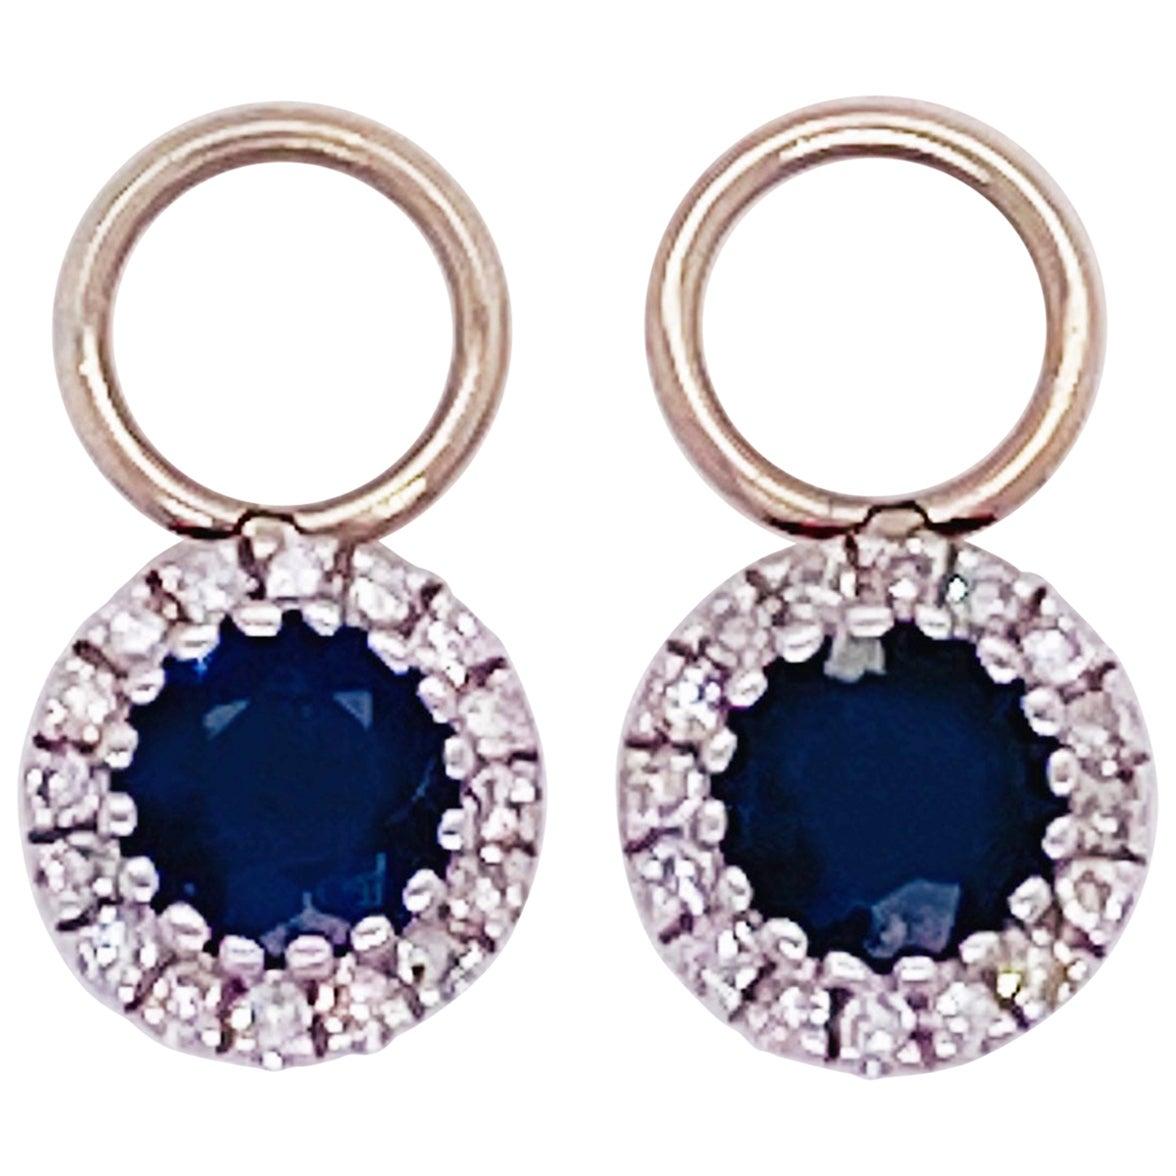 Sapphire Diamond Earring Charms 14 Karat Gold 3/4 Carat Blue Sapphire & Diamond